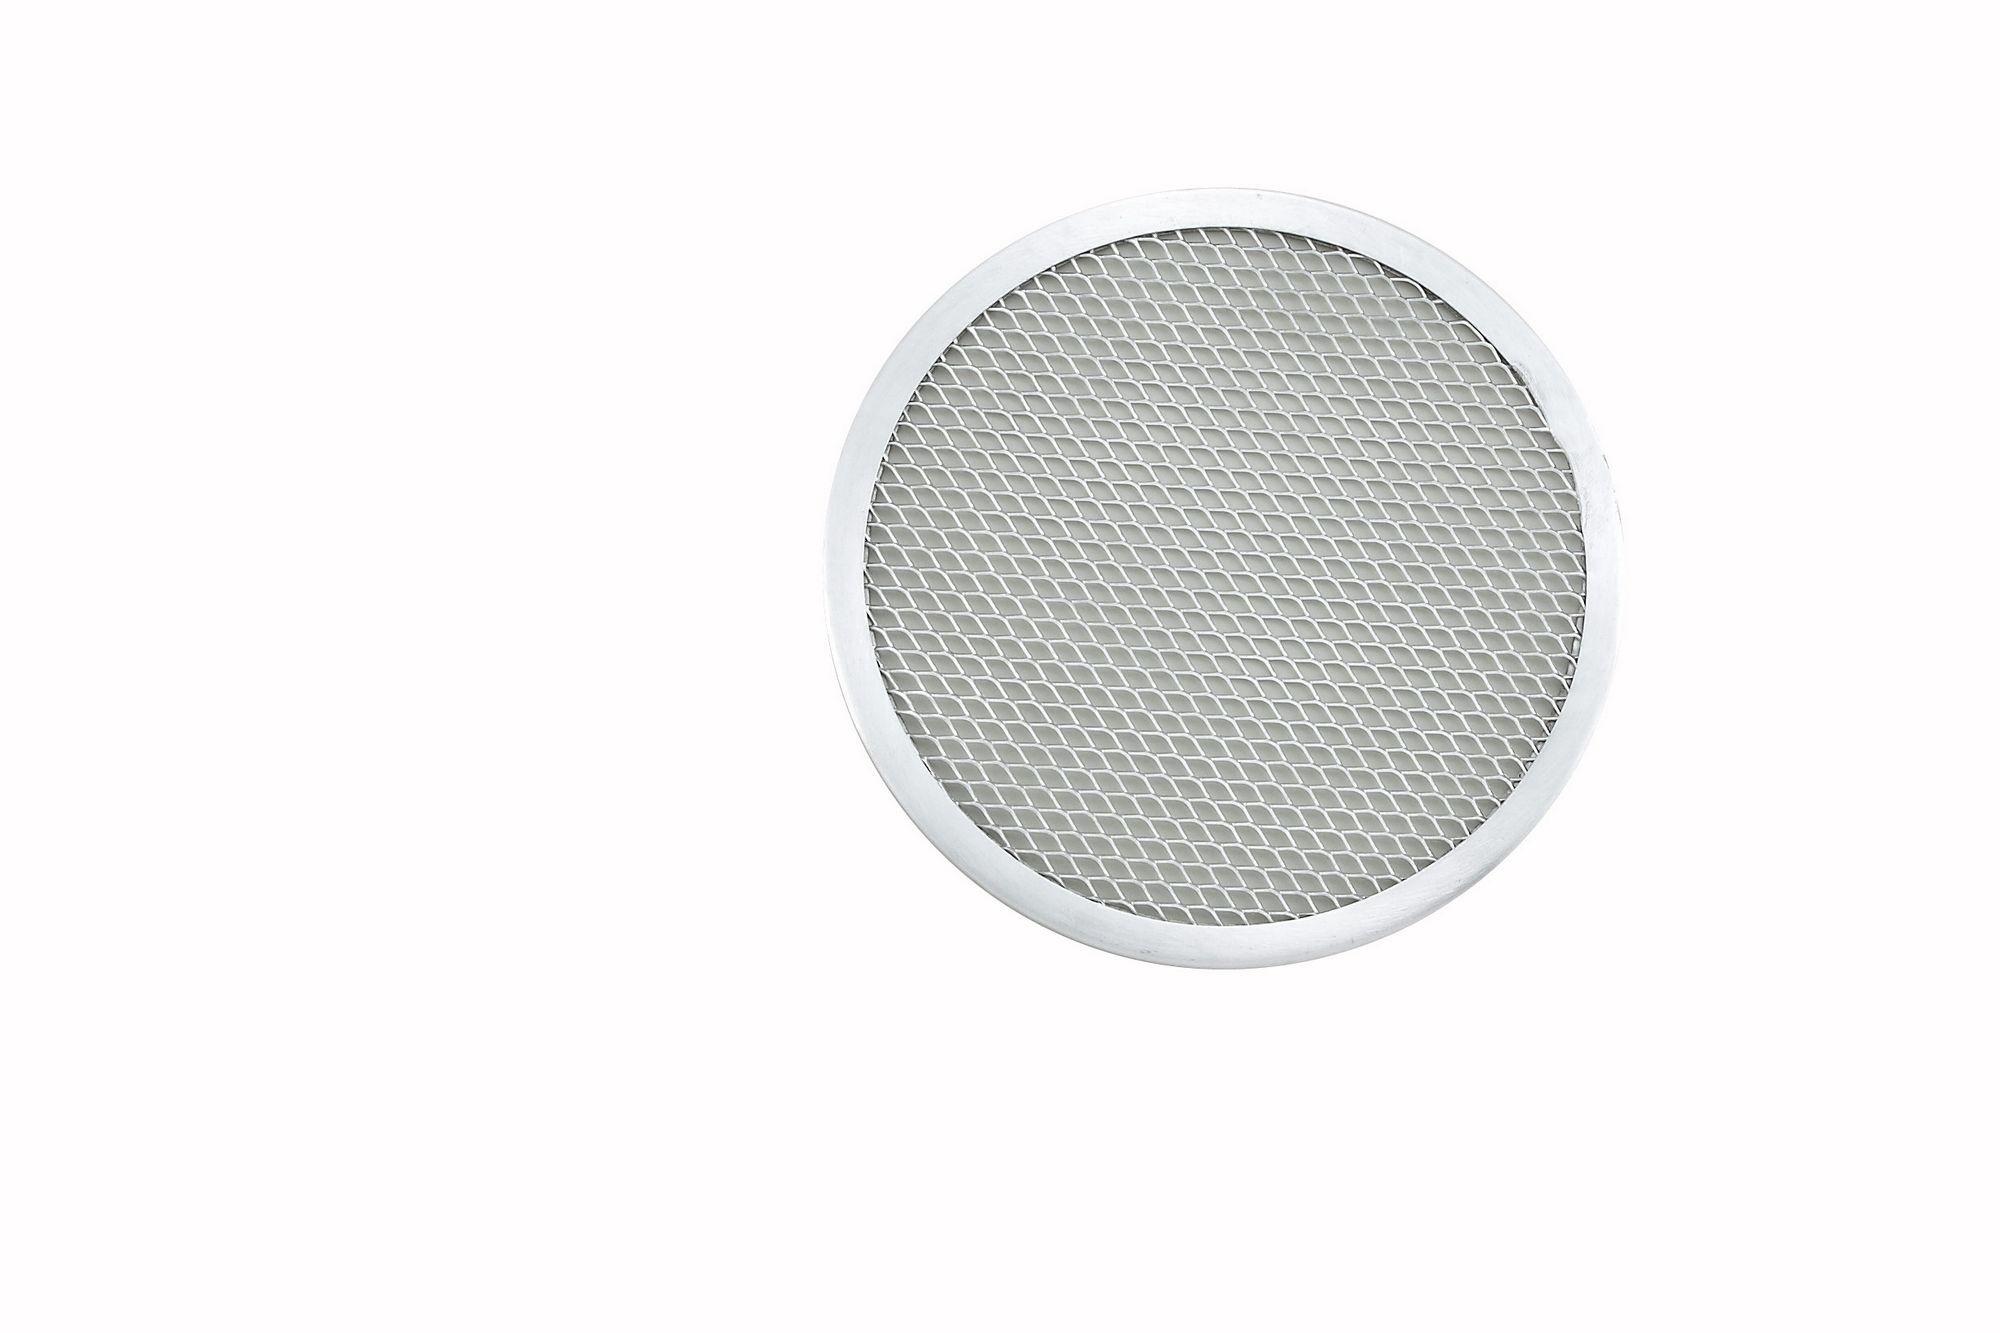 "Winco APZS-8 Seamless Aluminum Pizza Screen 8"" Dia."